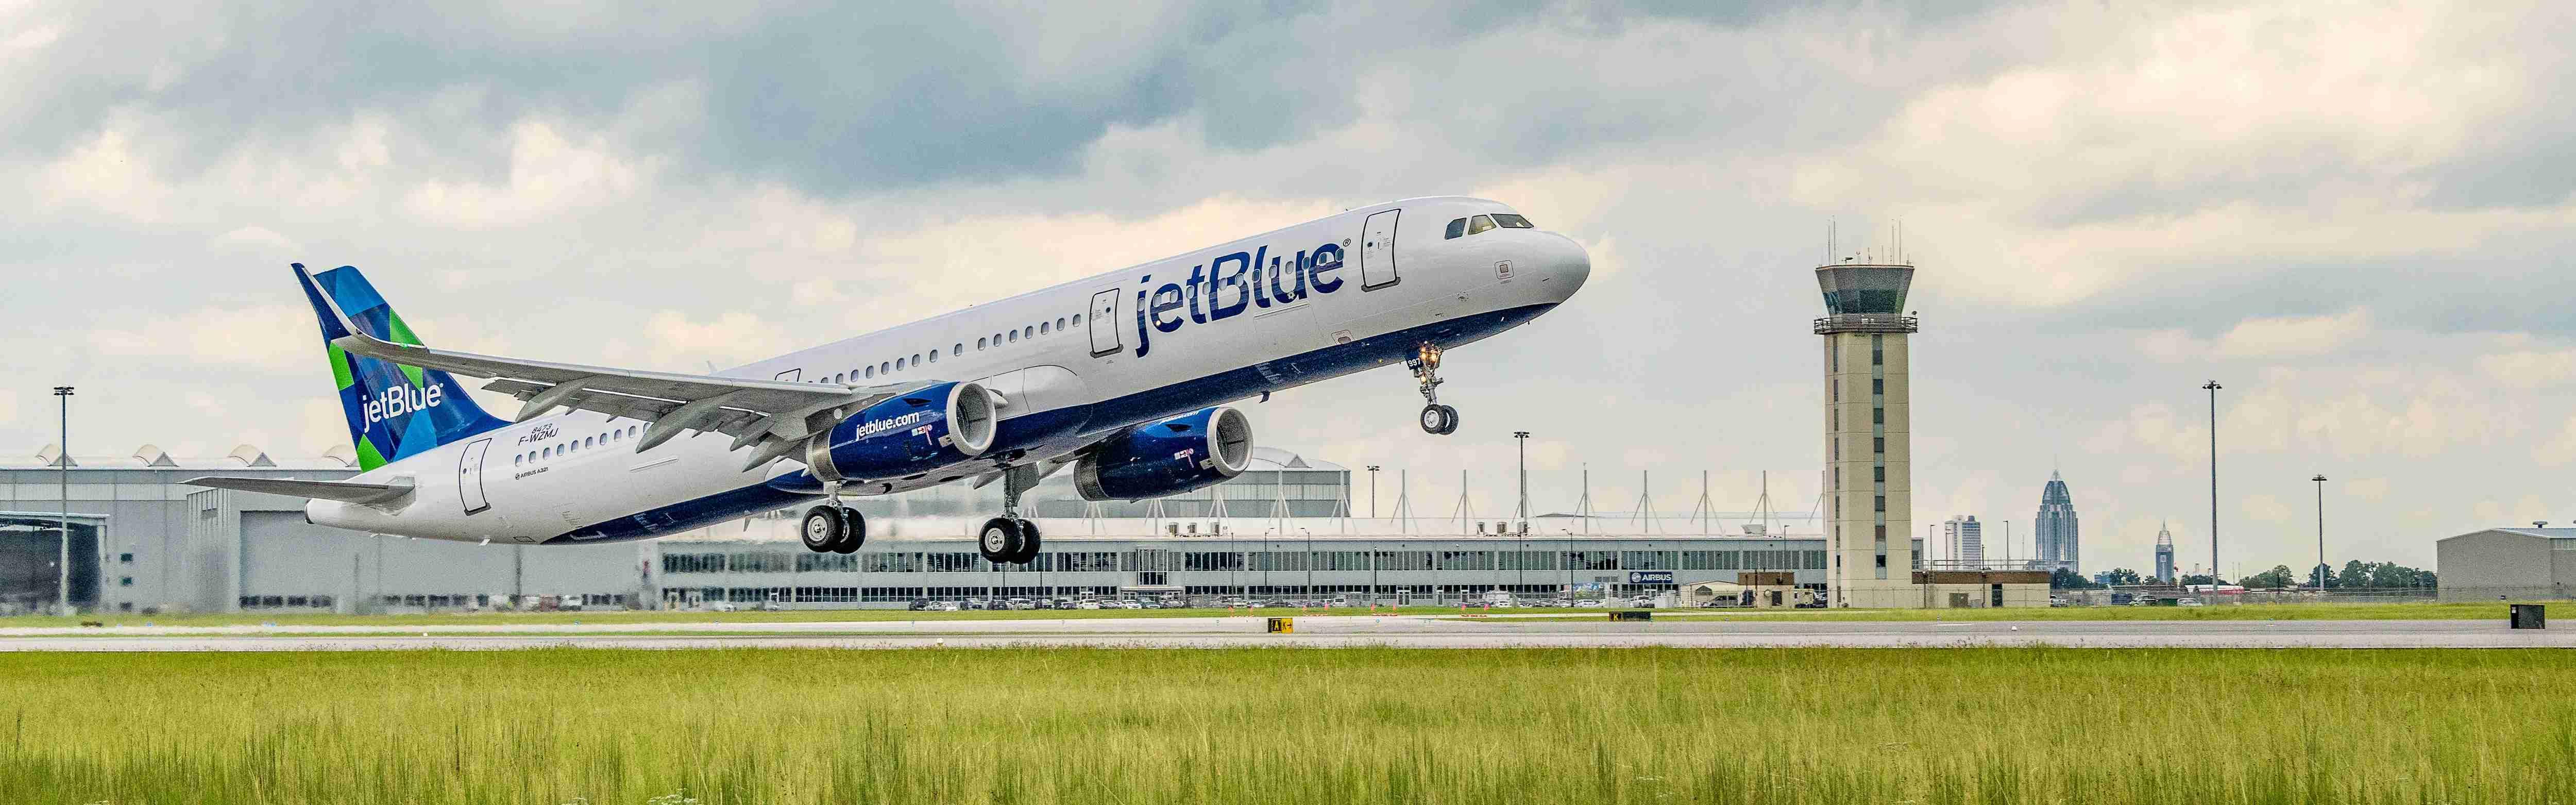 JetBlue renewable fuel a321